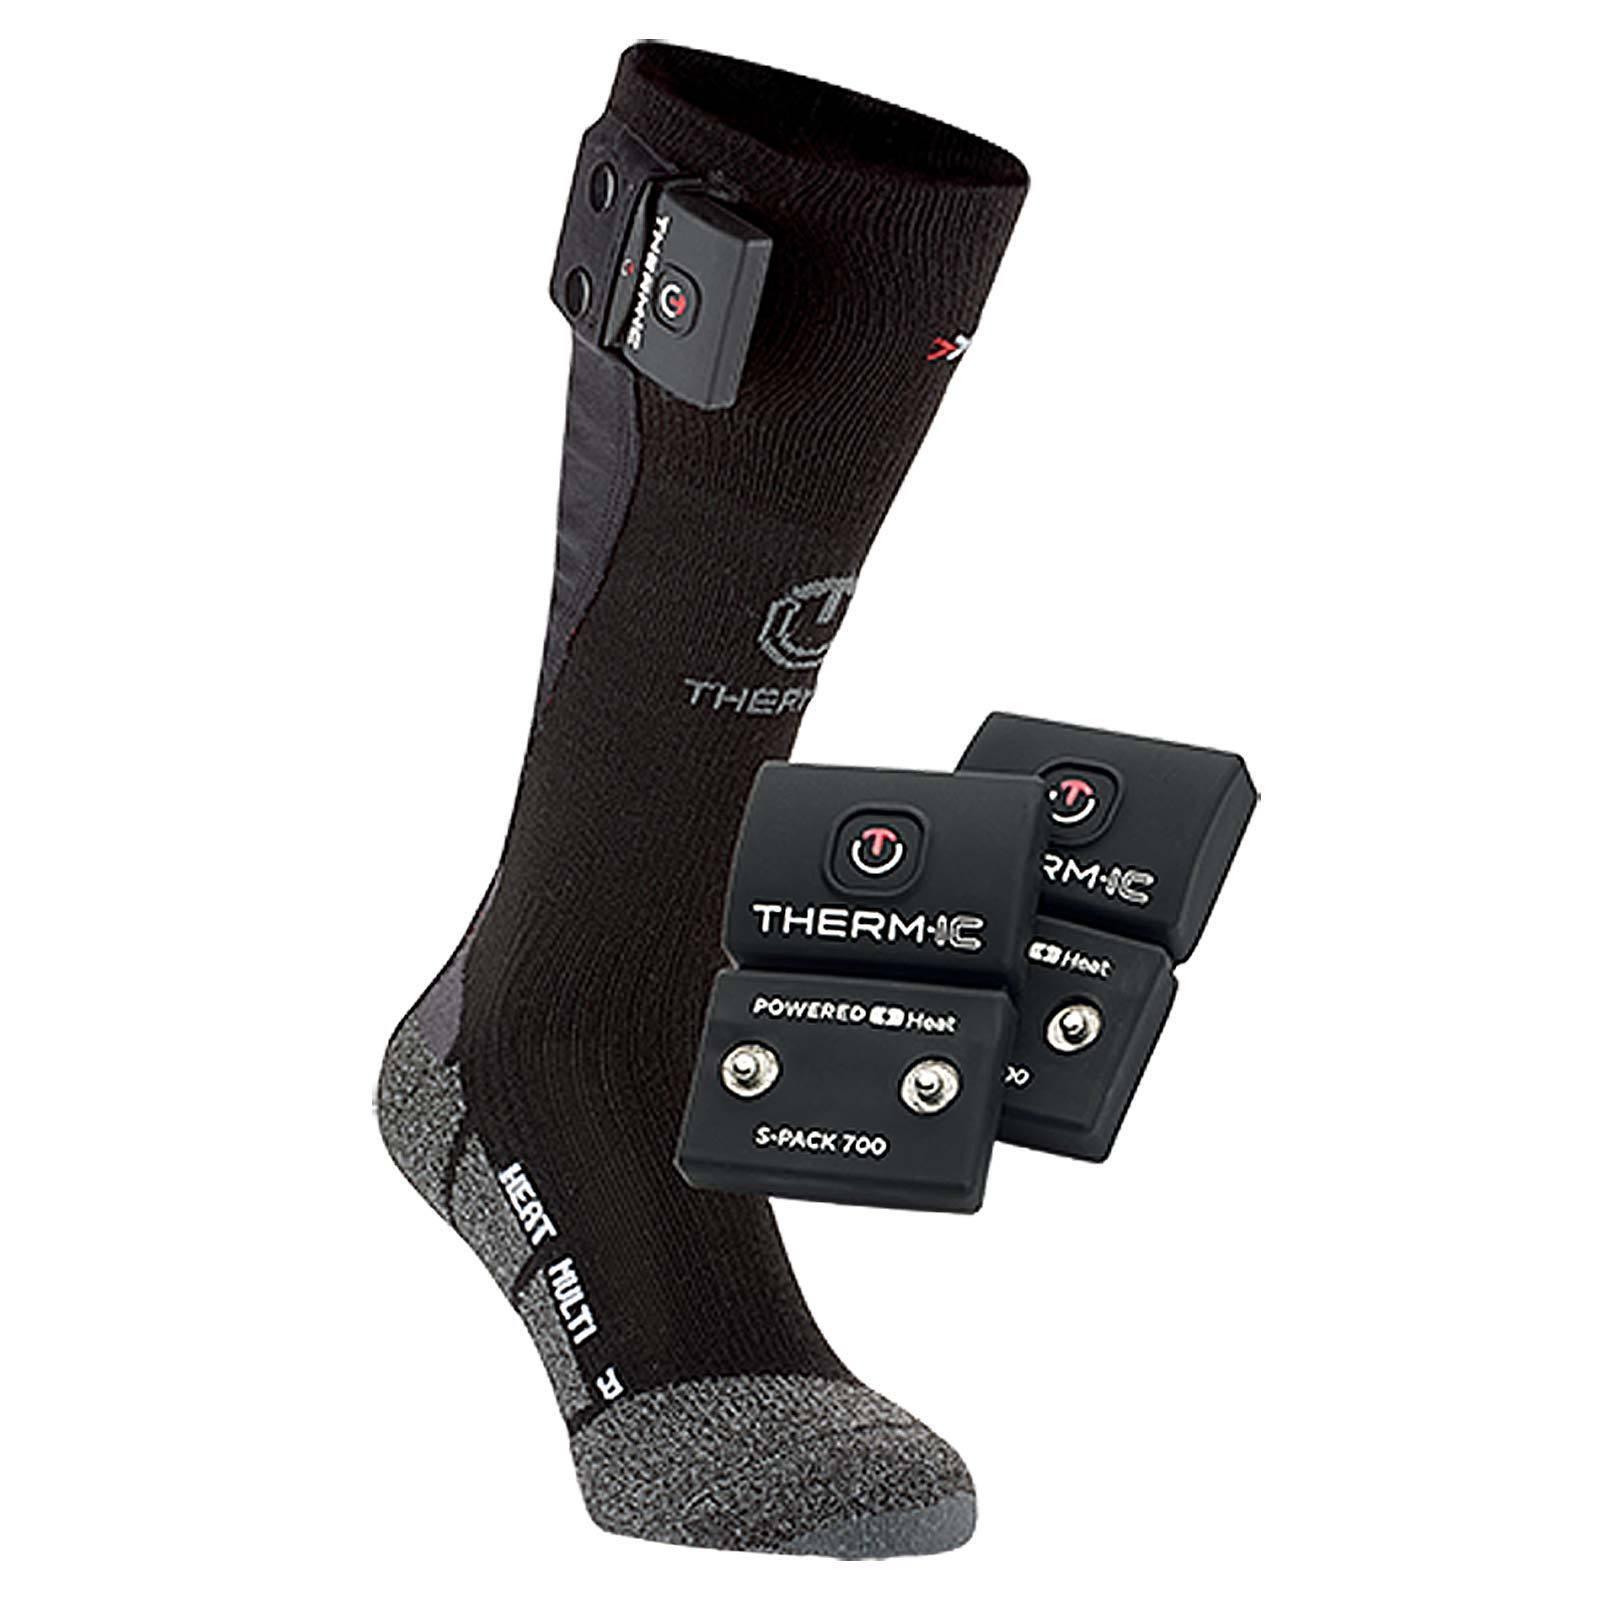 Termico Powersock Set S-PACK 700 Heiz-Socken Calzini da Sci Riscaldata Nuovo